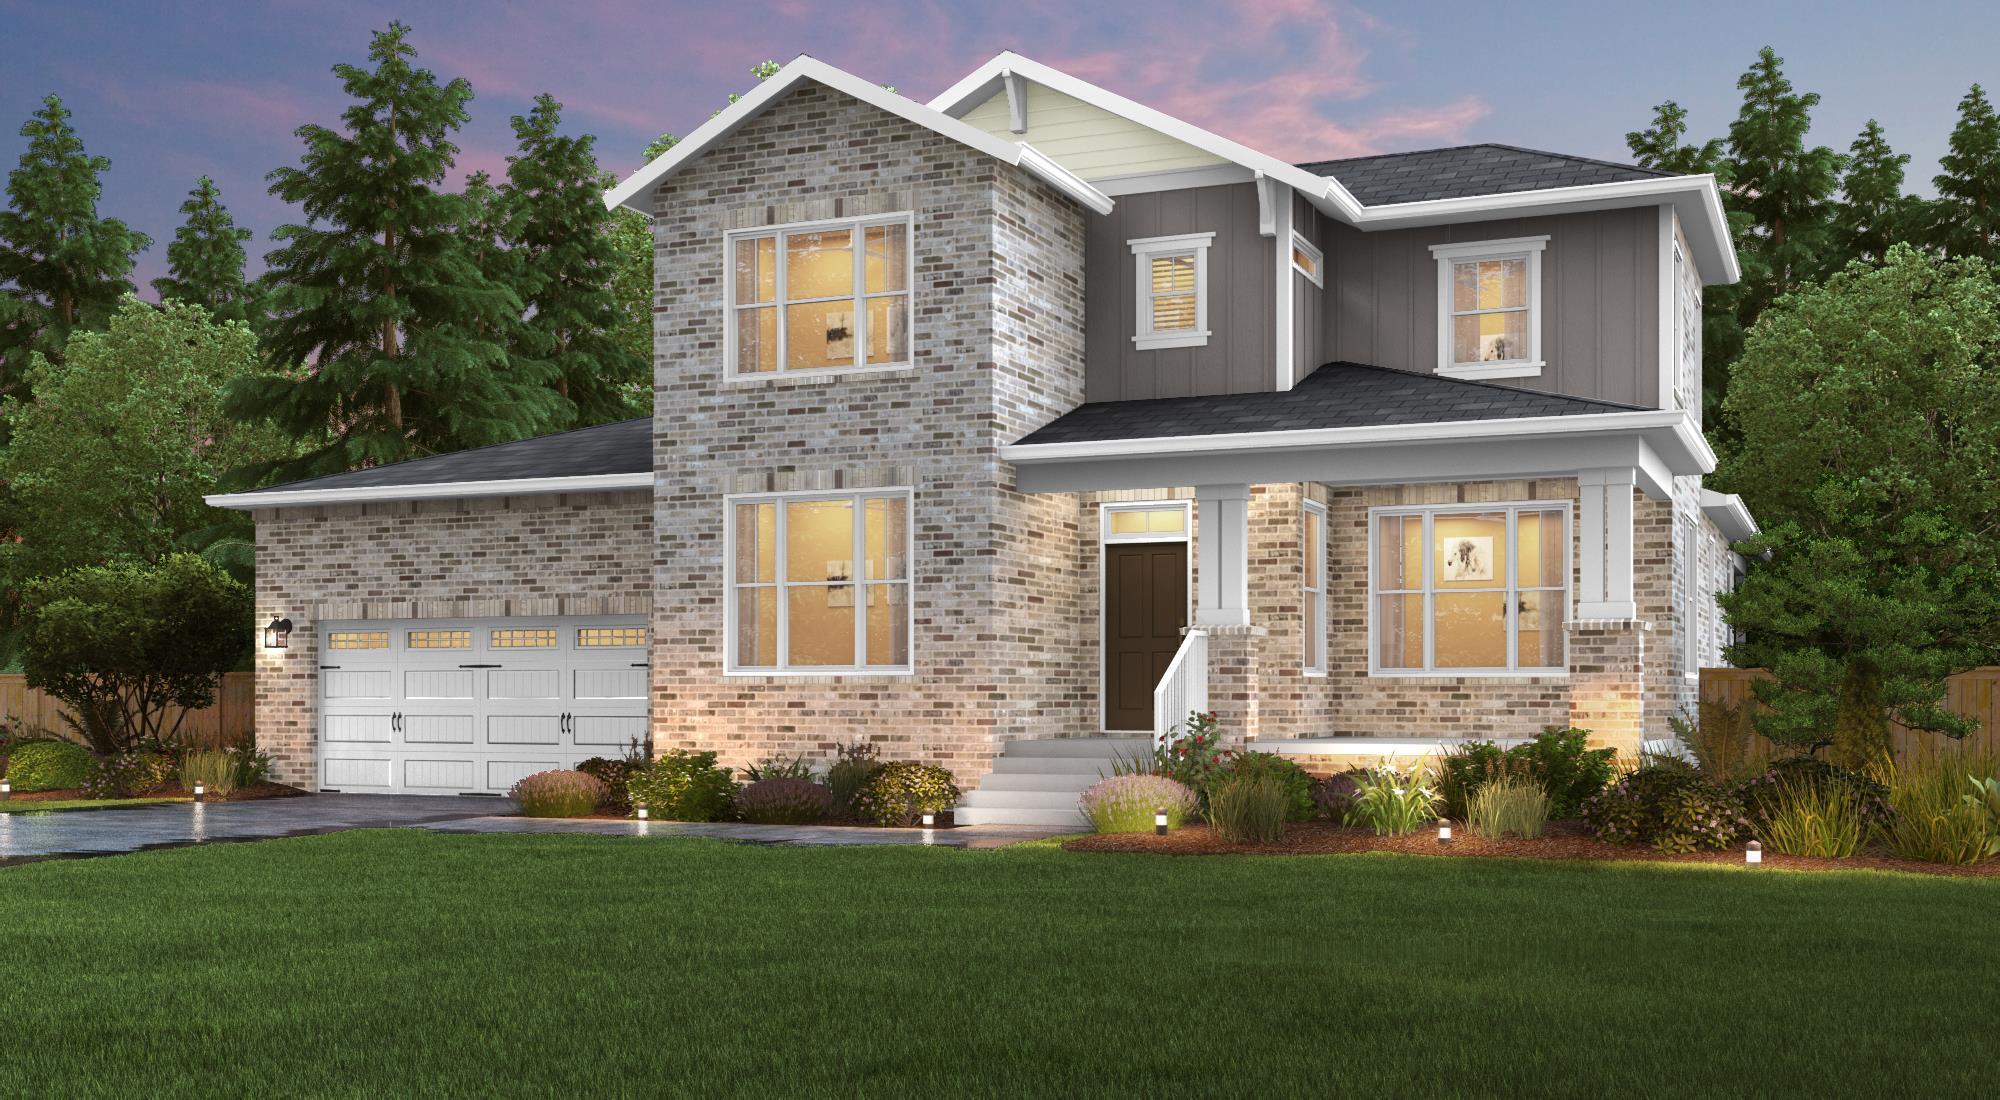 601 Disley Way Lot 57, Murfreesboro, TN 37128 - Murfreesboro, TN real estate listing